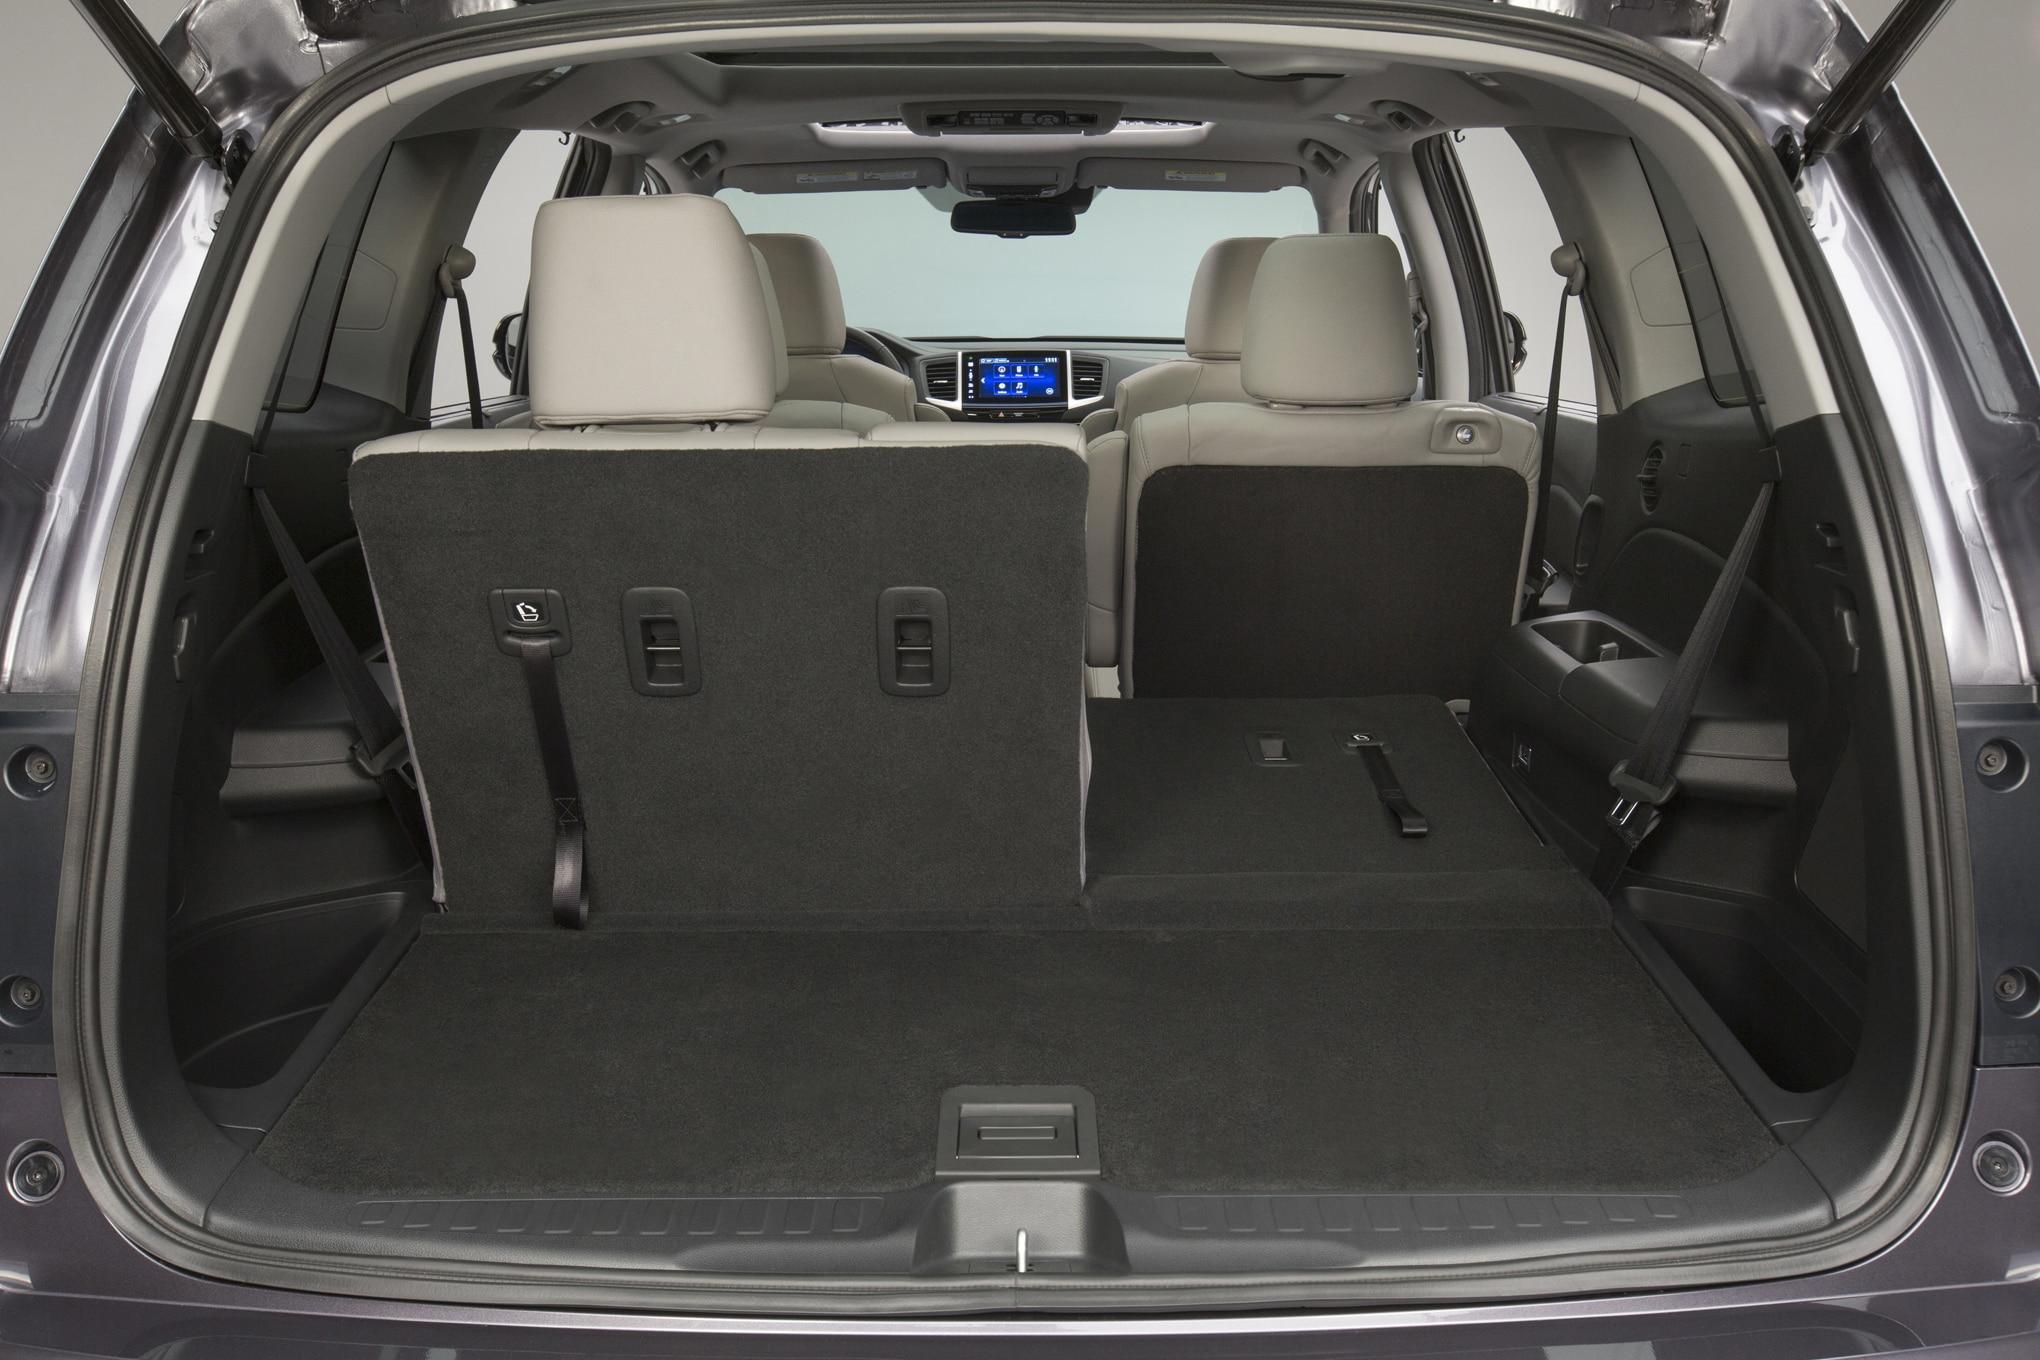 Audi truck 2016 q7 interior 3rd row seat 7